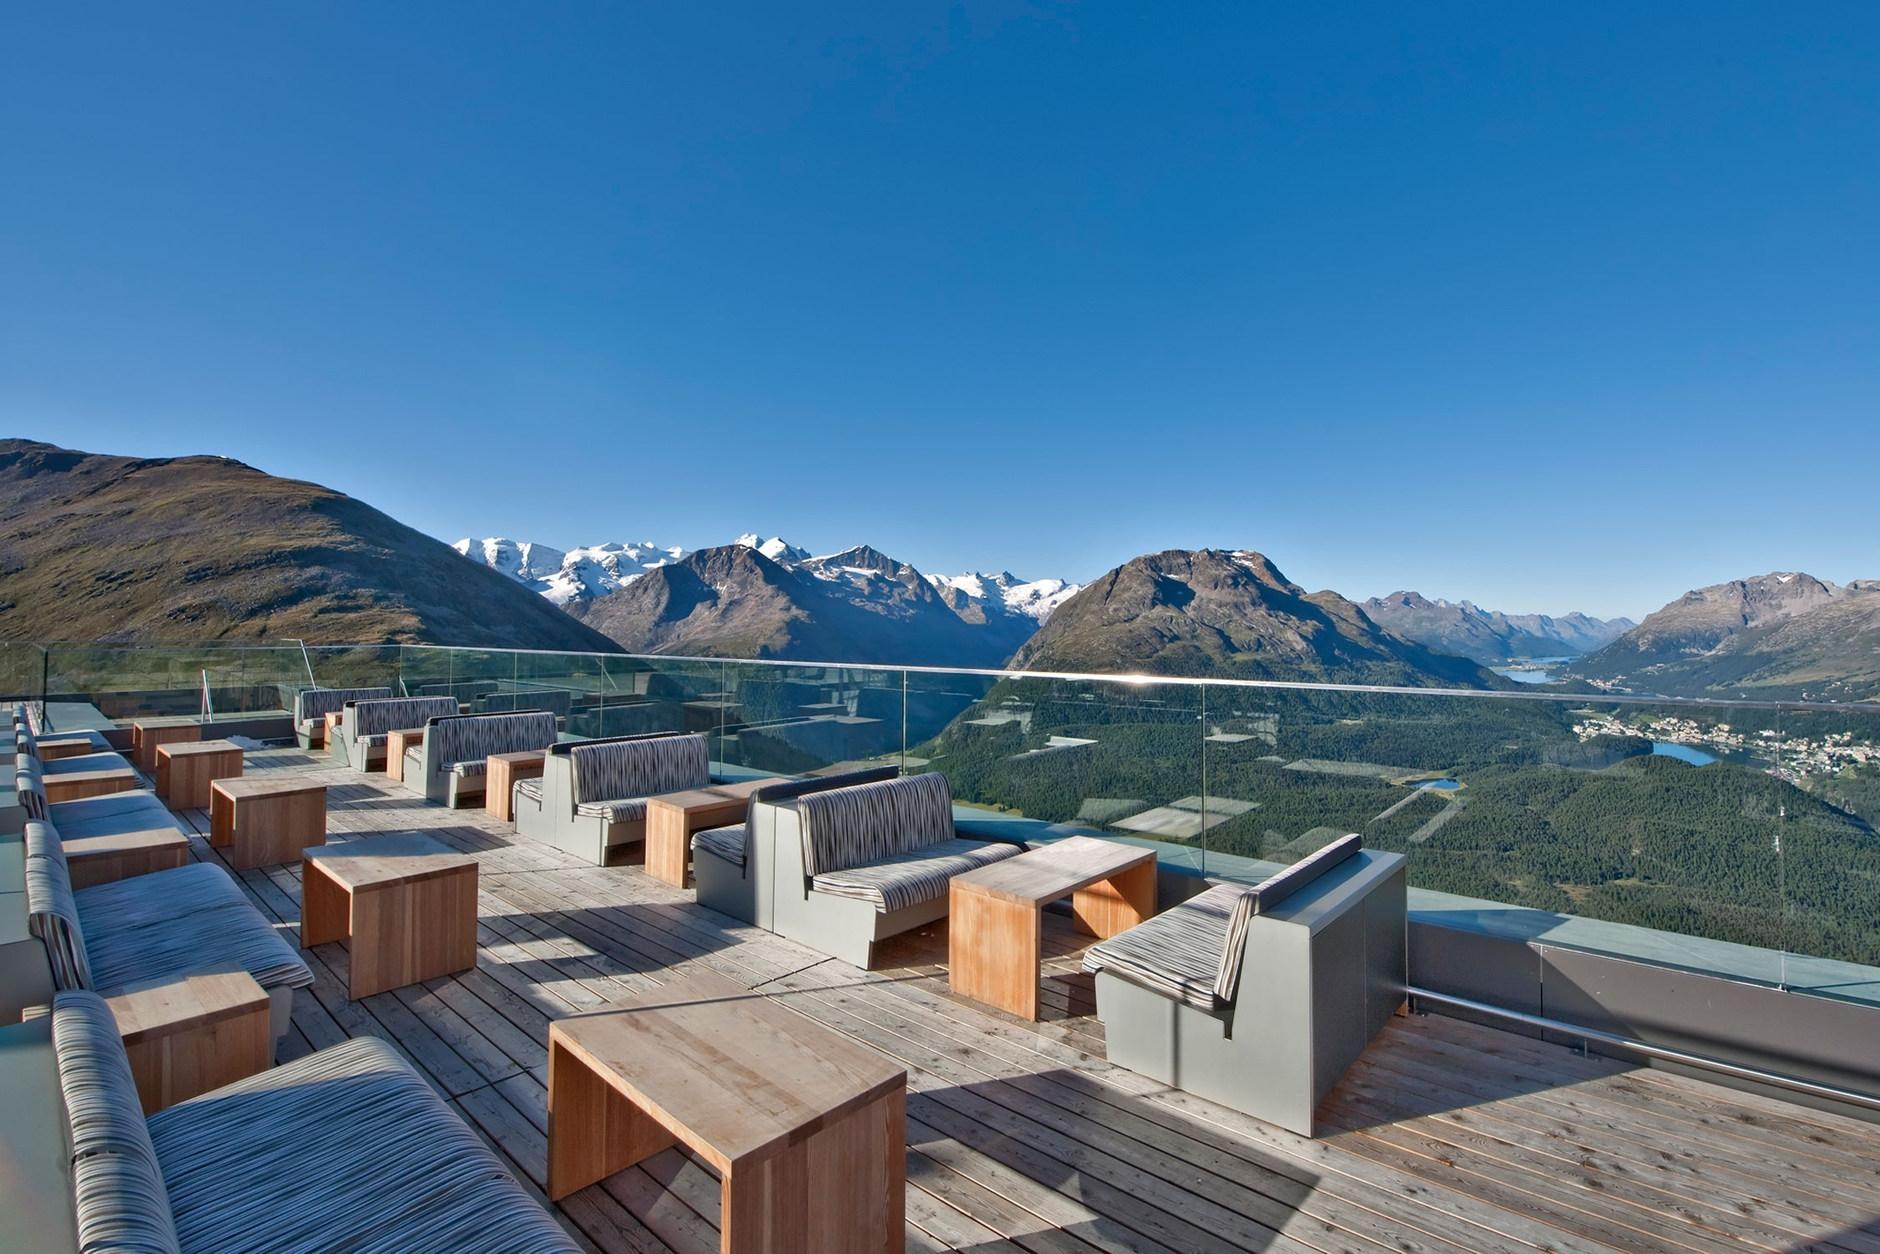 Muottas muragl hotel by franzun ag karmatrendz for Berghotel design